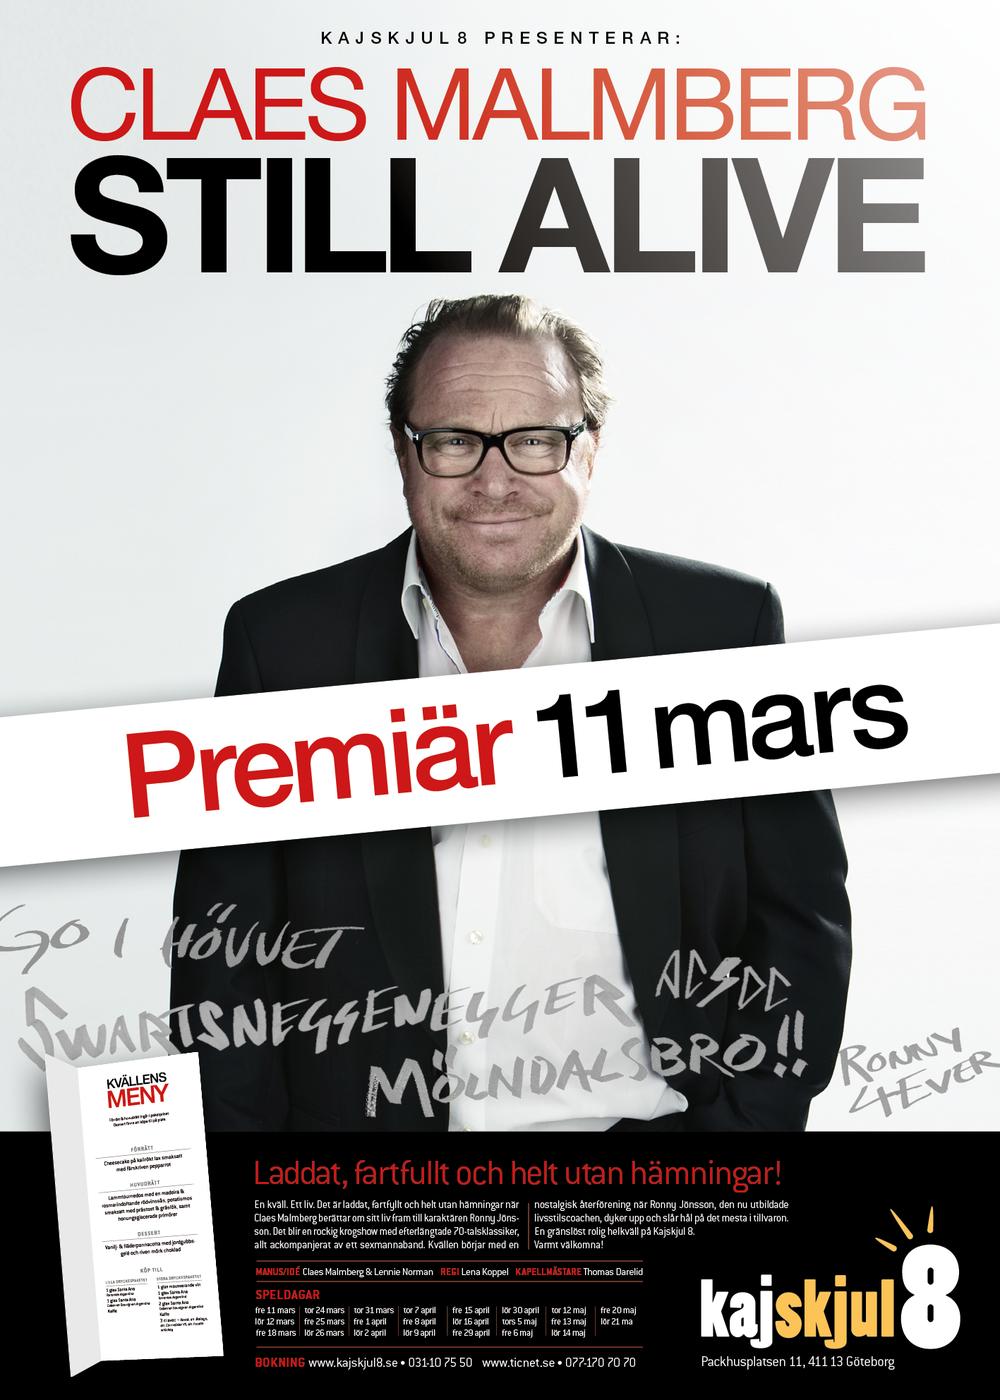 StillAlive-Poster-50x70mm-high-02.png